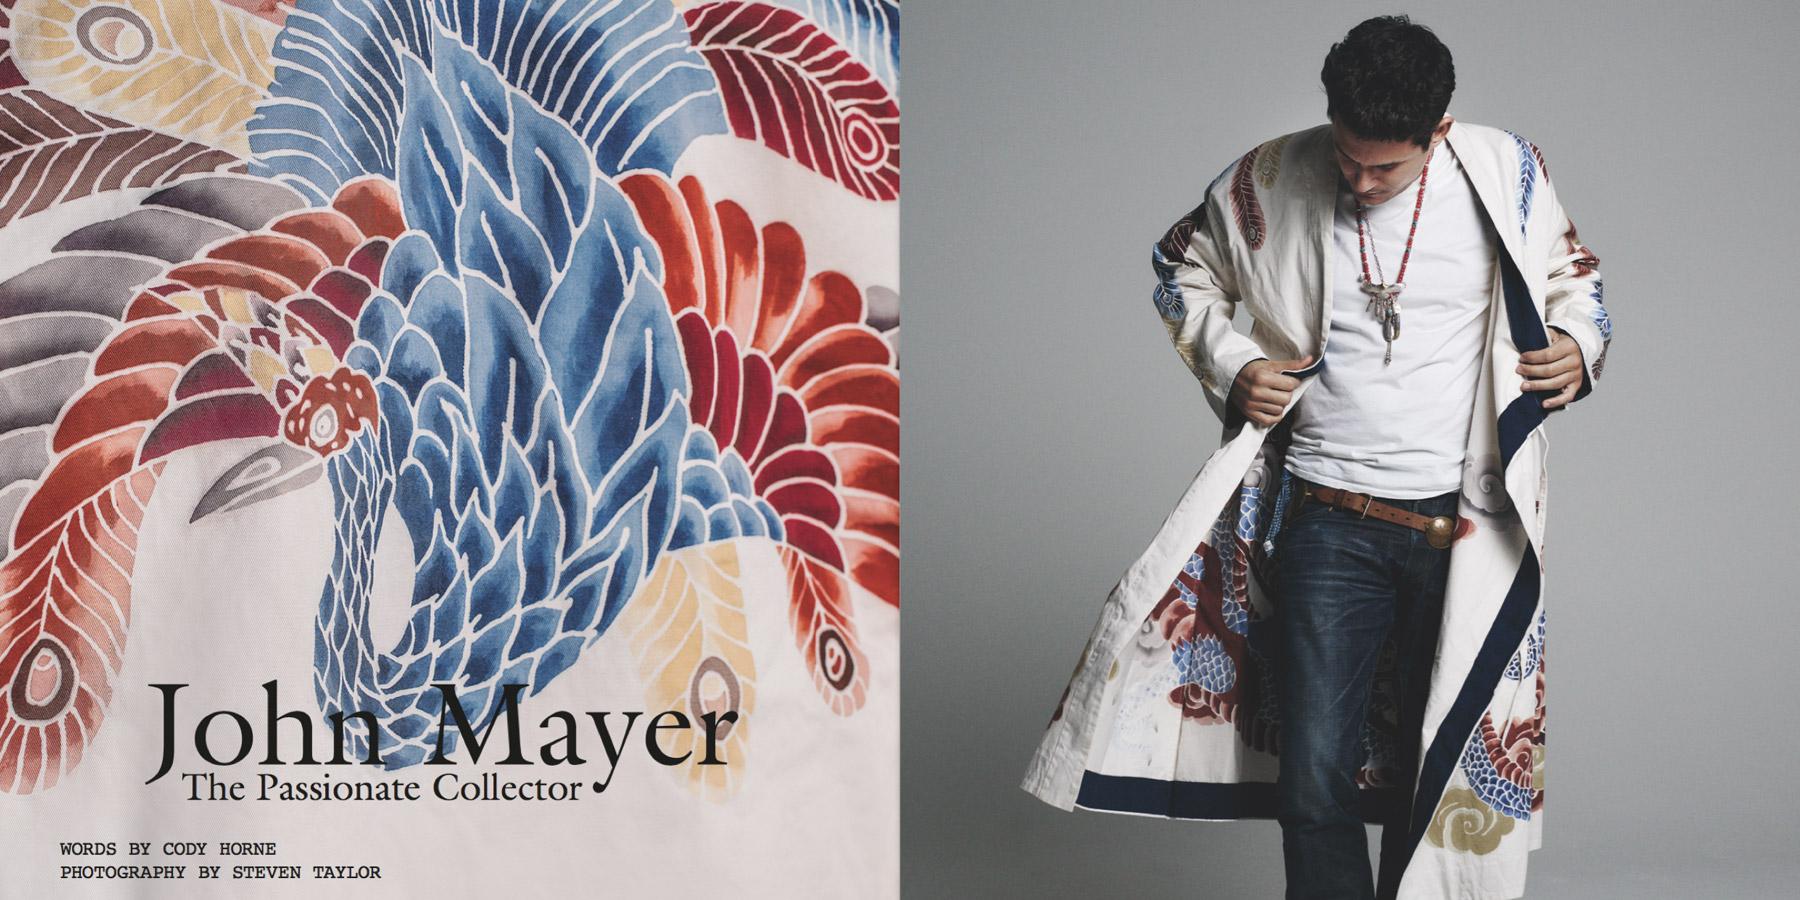 Hypebeast Magazine 14 John Mayer cover story